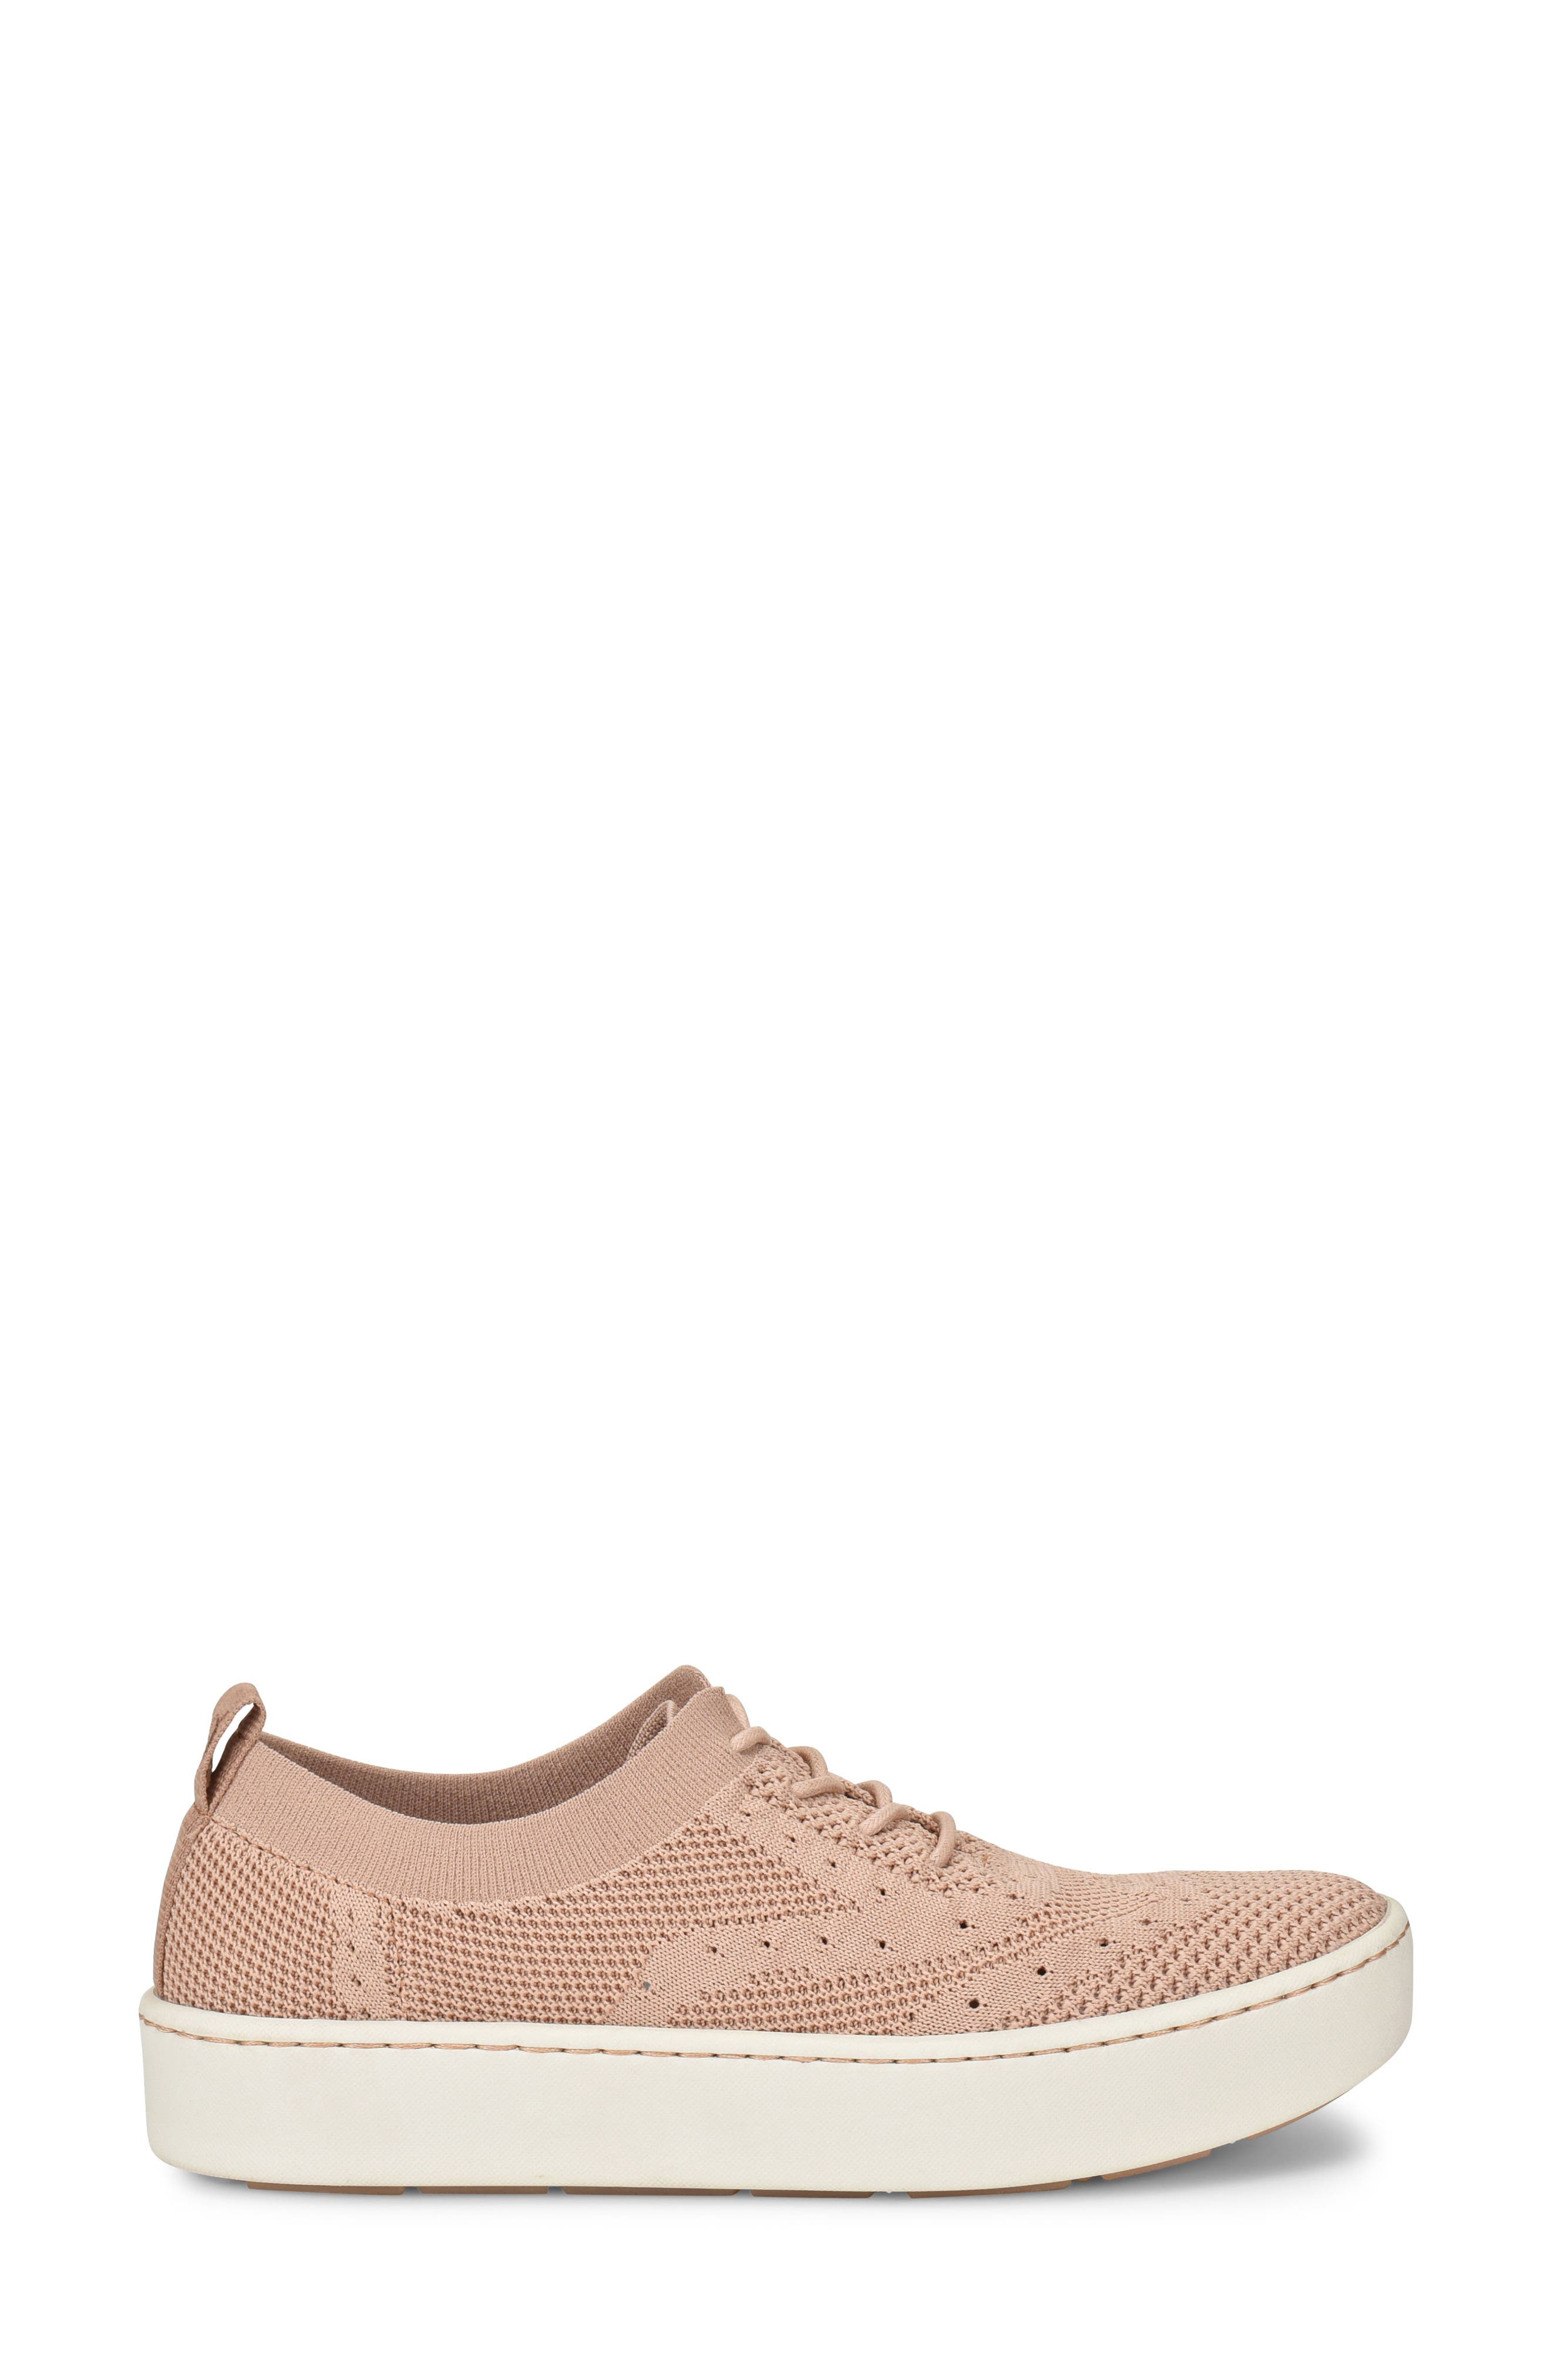 Alternate Image 3  - Børn Sunburst Wingtip Sneaker (Women)